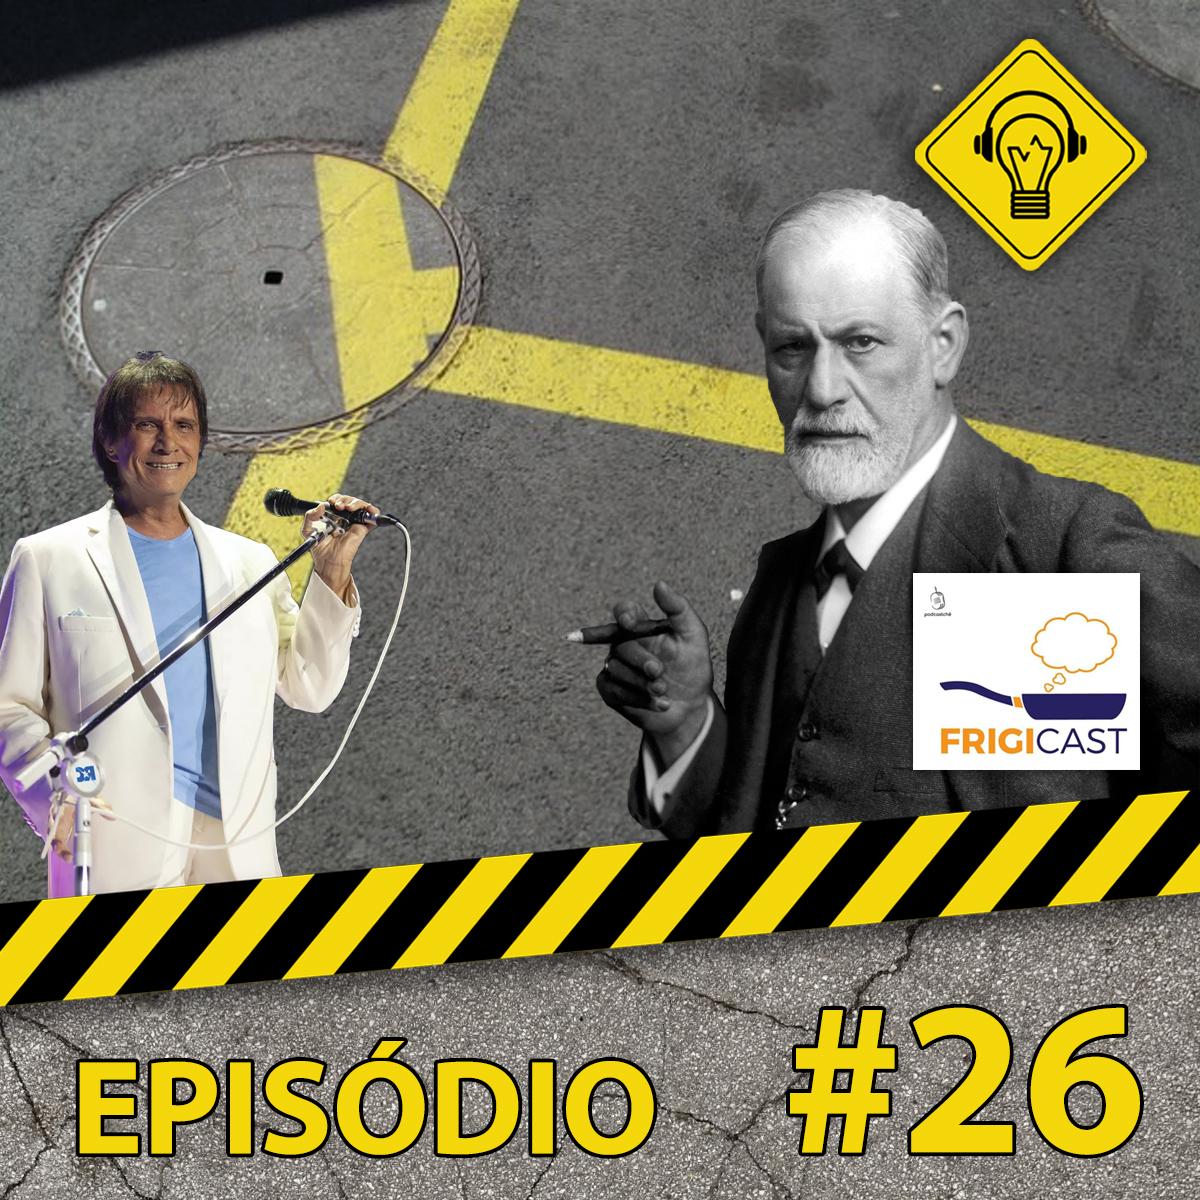 Ideia Errada #26: TOC feat. Frigicast / José Milton Kotzent